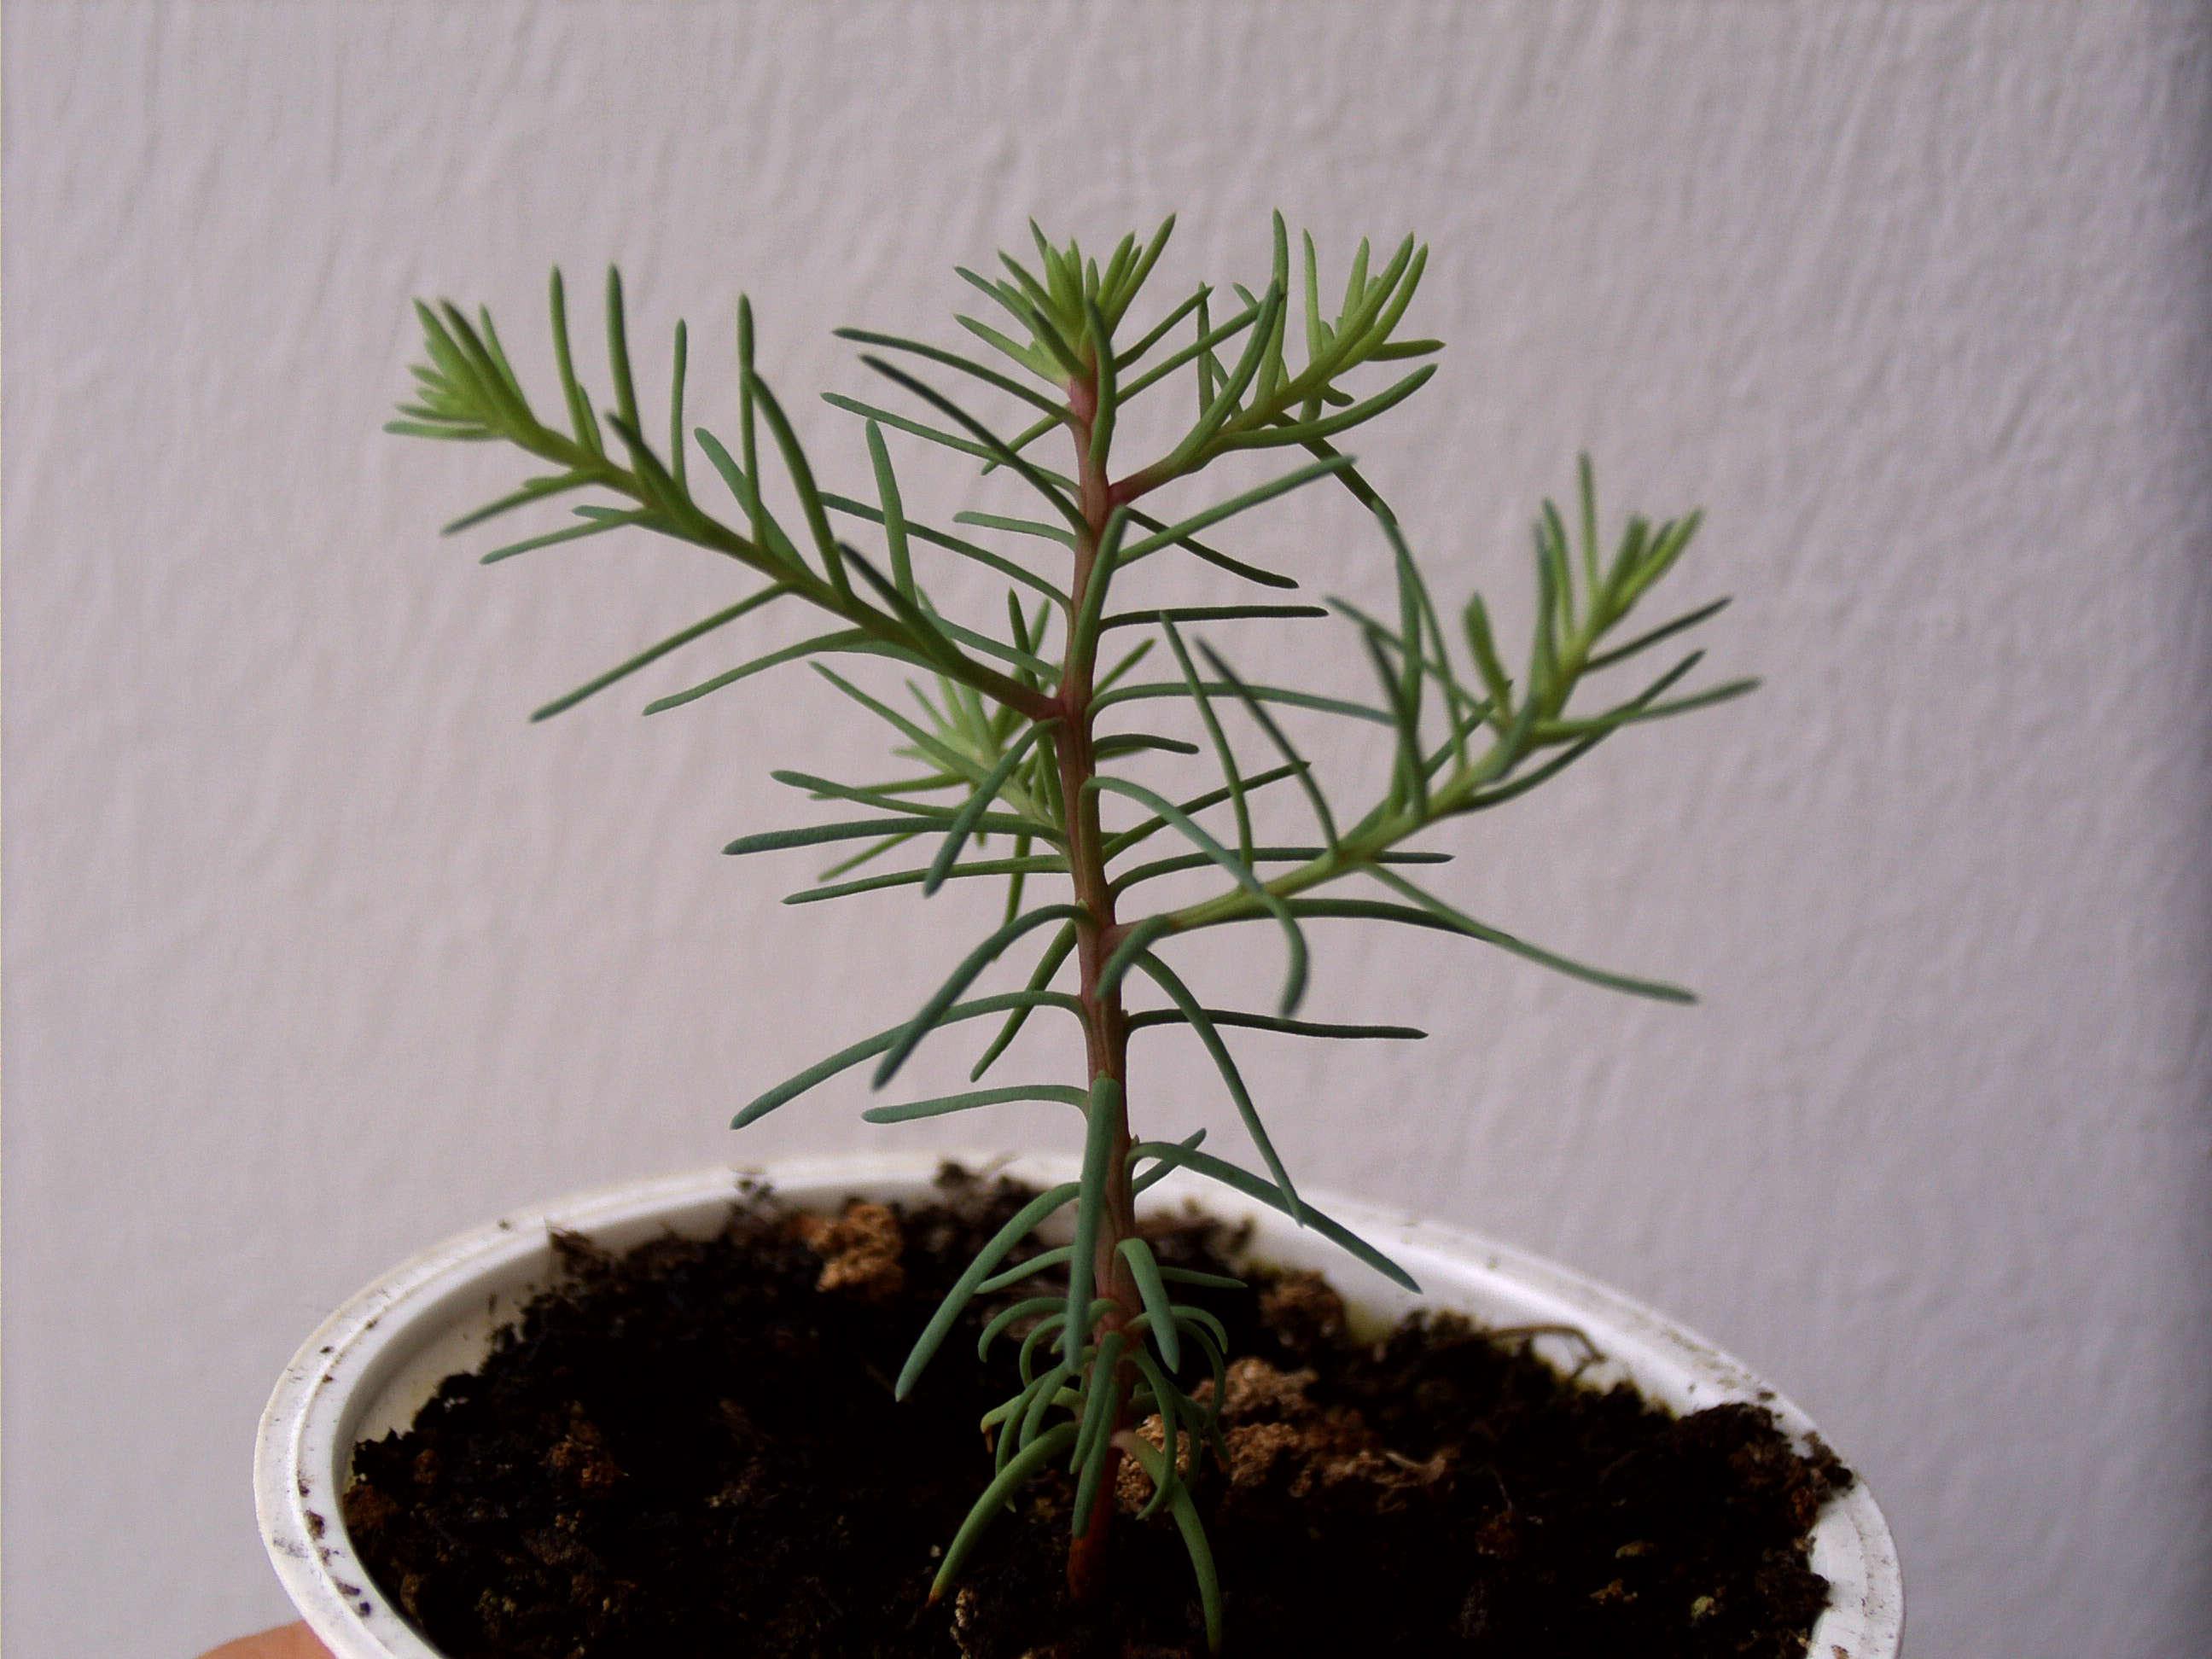 Unthinkable House Plant Tree. Gardening 101  Giant Sequoia Gardenista Sourcebook for Outdoor